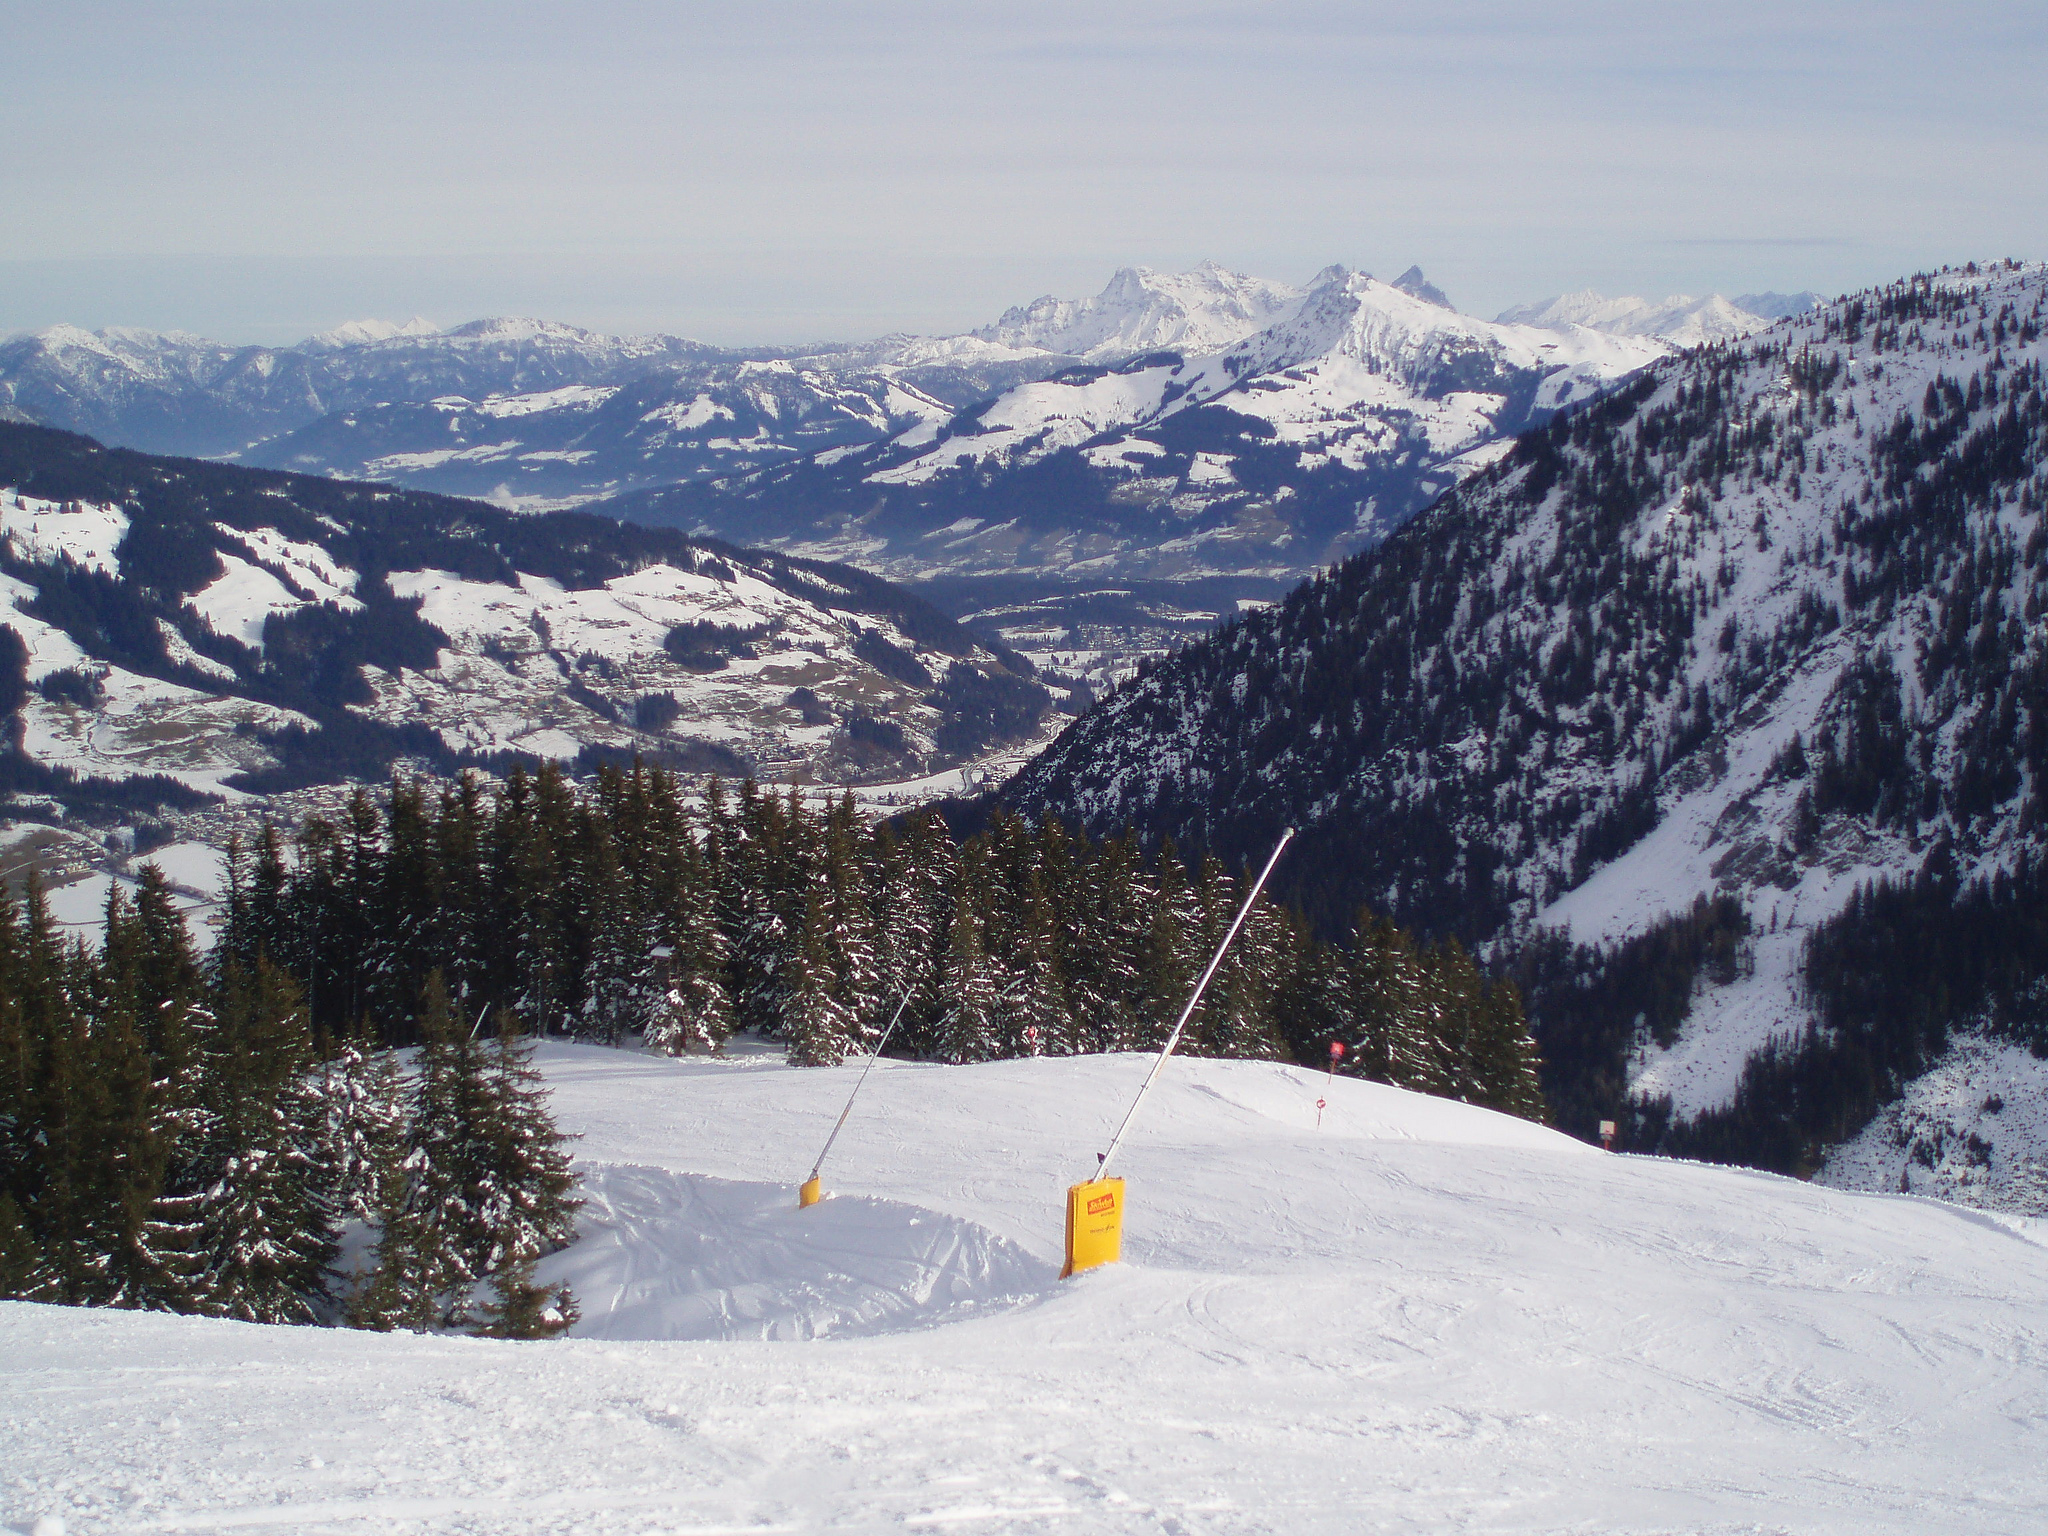 Ski resort Ellmau - Photos - TopSkiResort.com